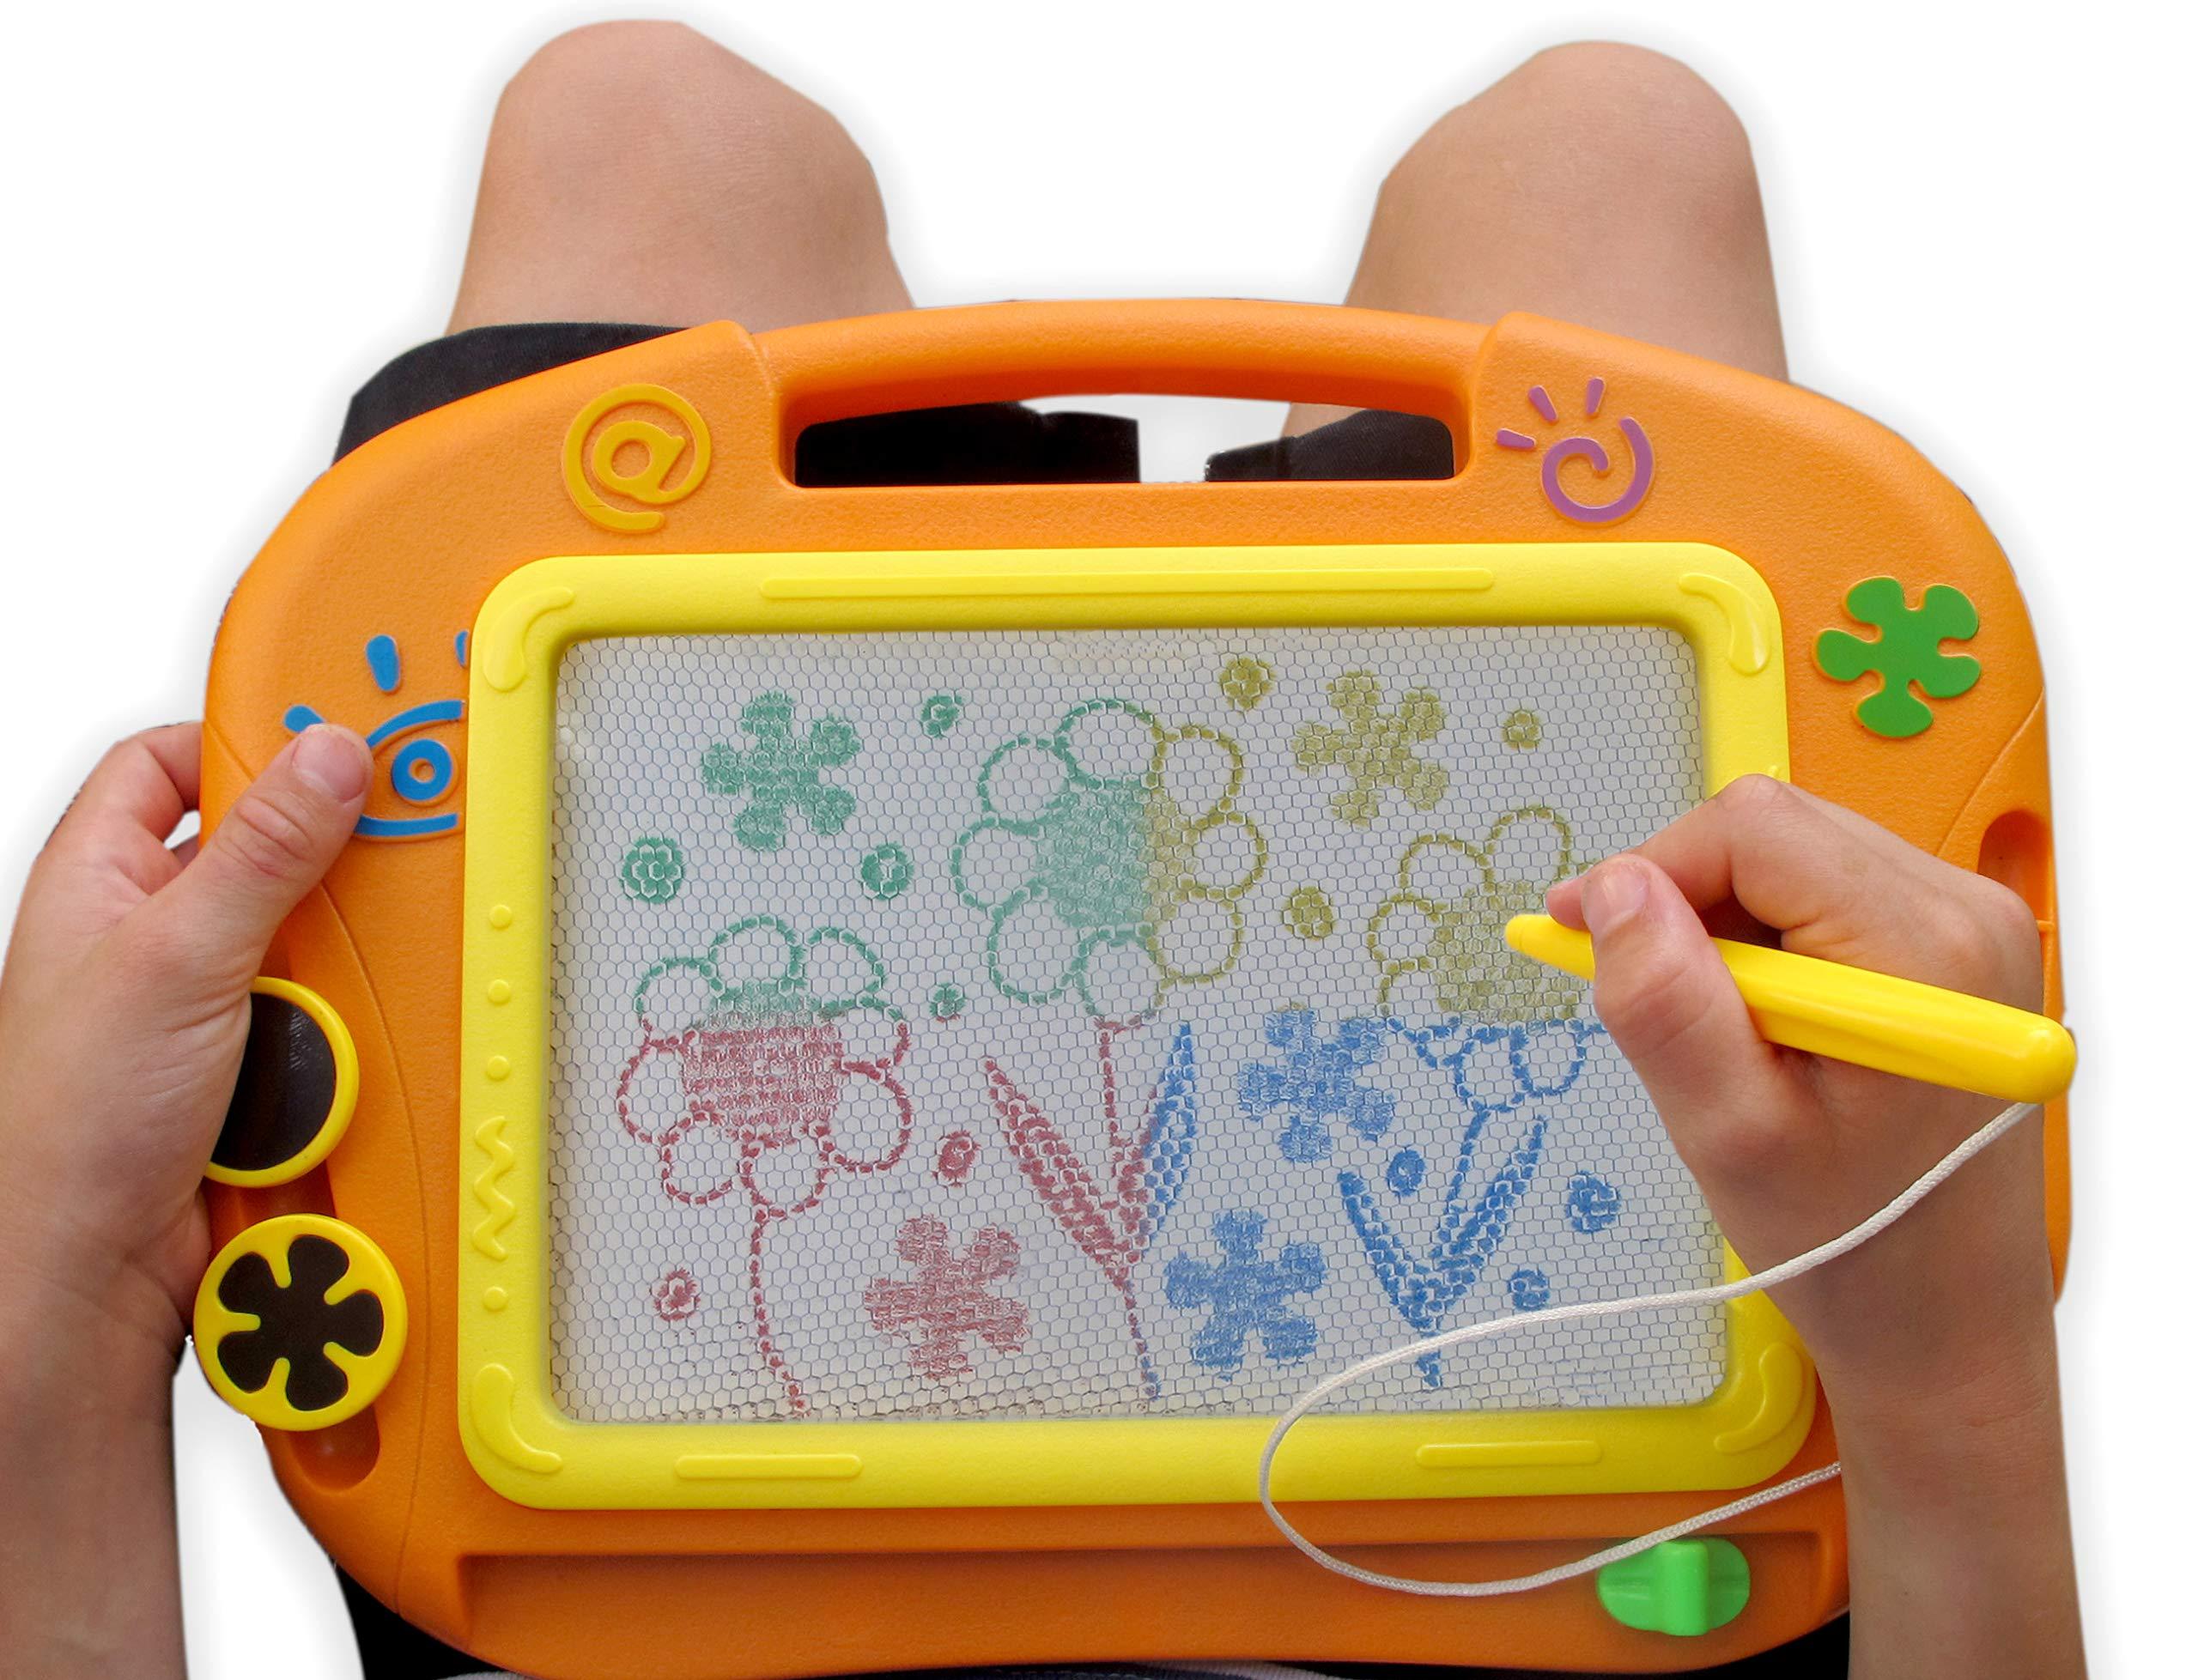 Gabe & Ko Erasable Magnetic Orange Drawing Board Pen Two Magnetic Stampers - Travel Size Boys Girls